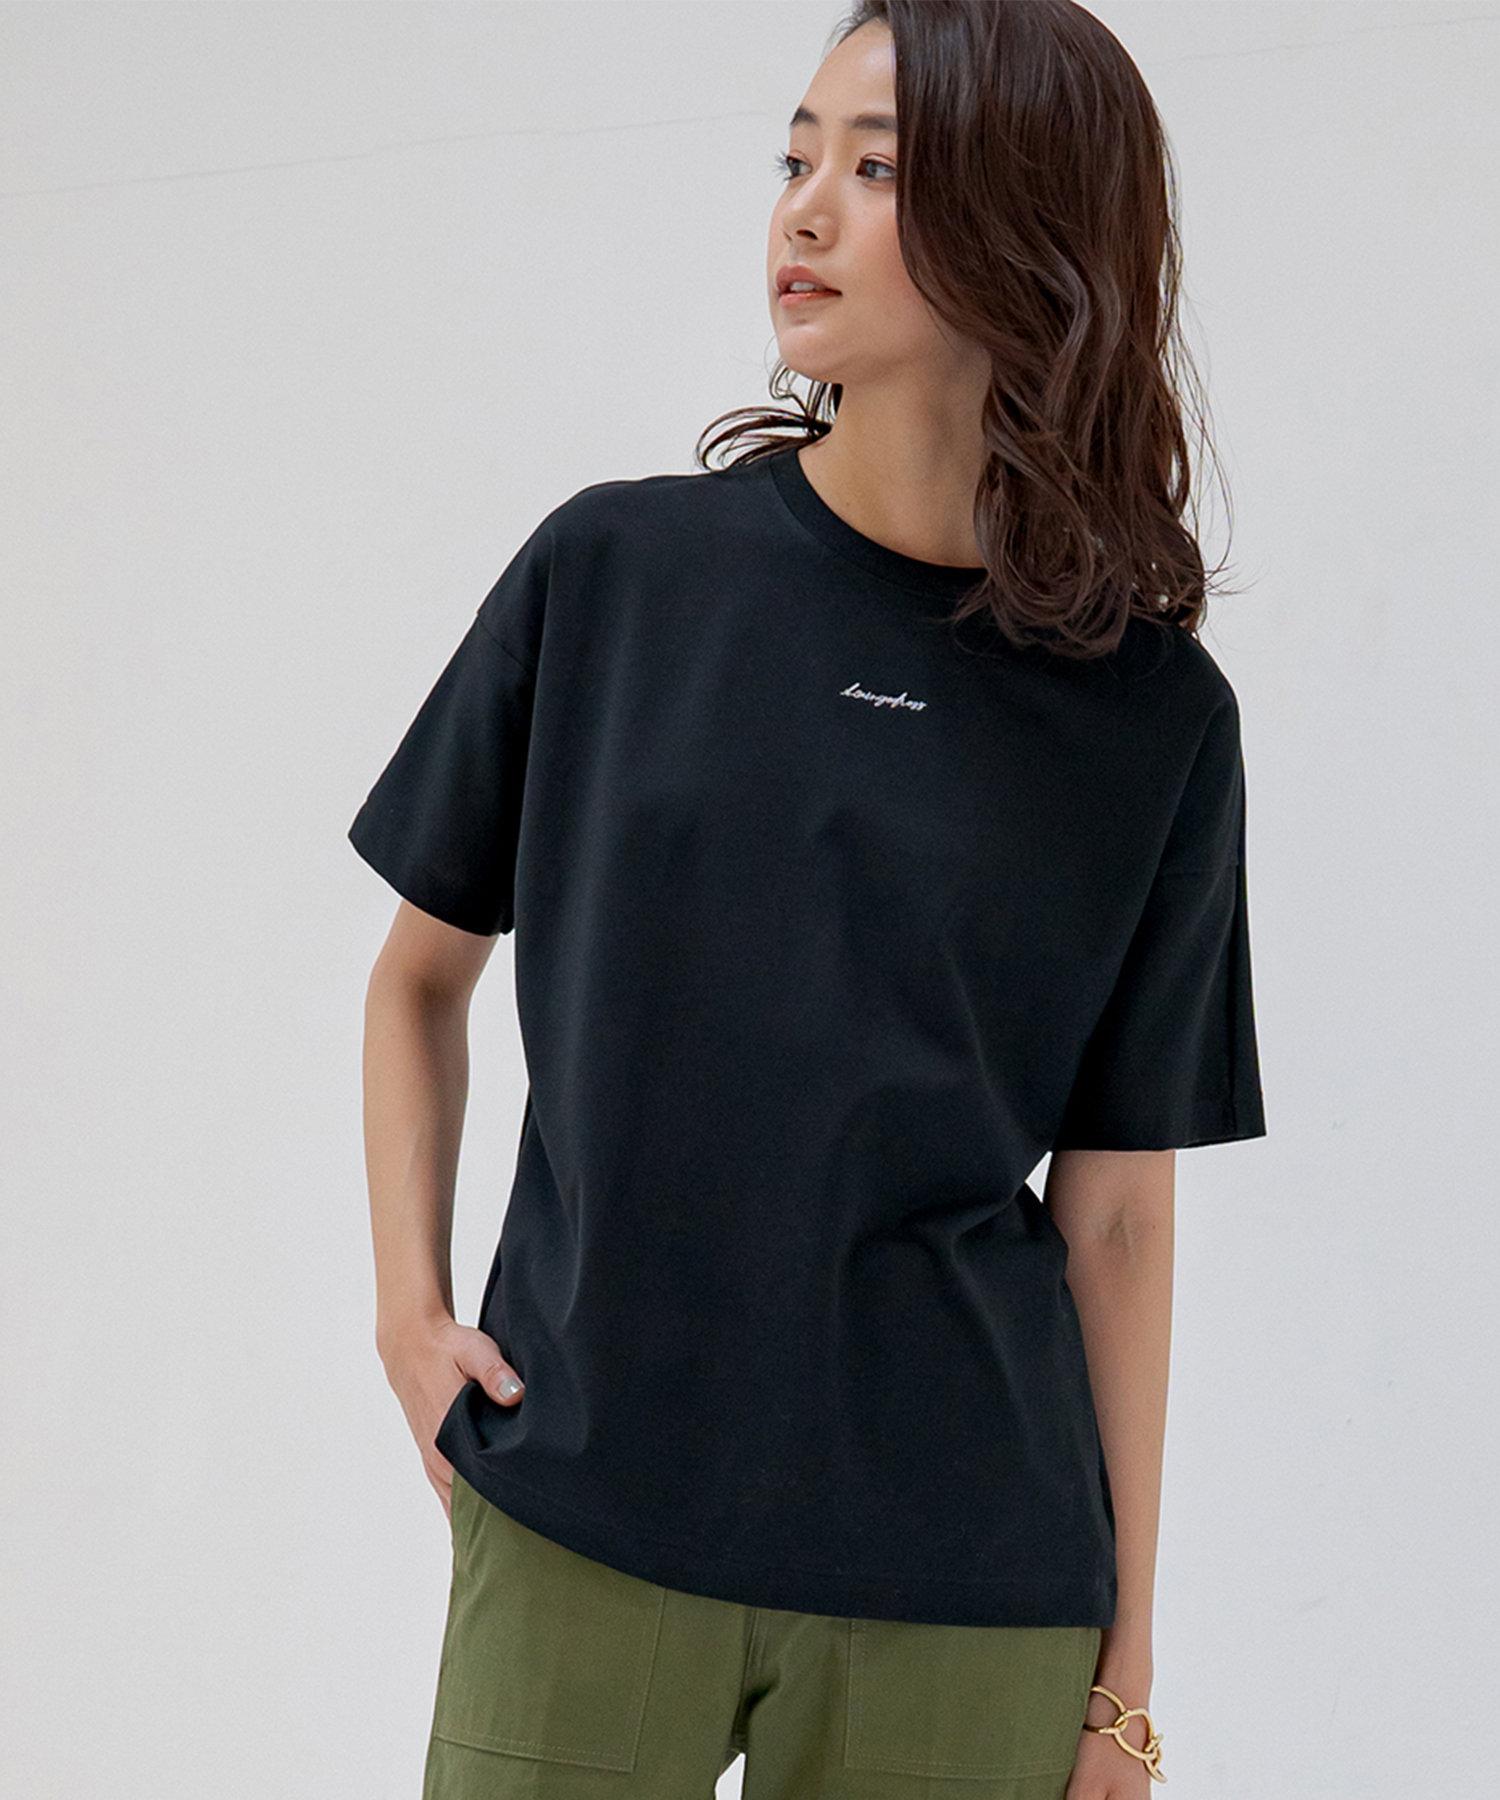 Loungedress(ラウンジドレス) エンブロイダリーTシャツ